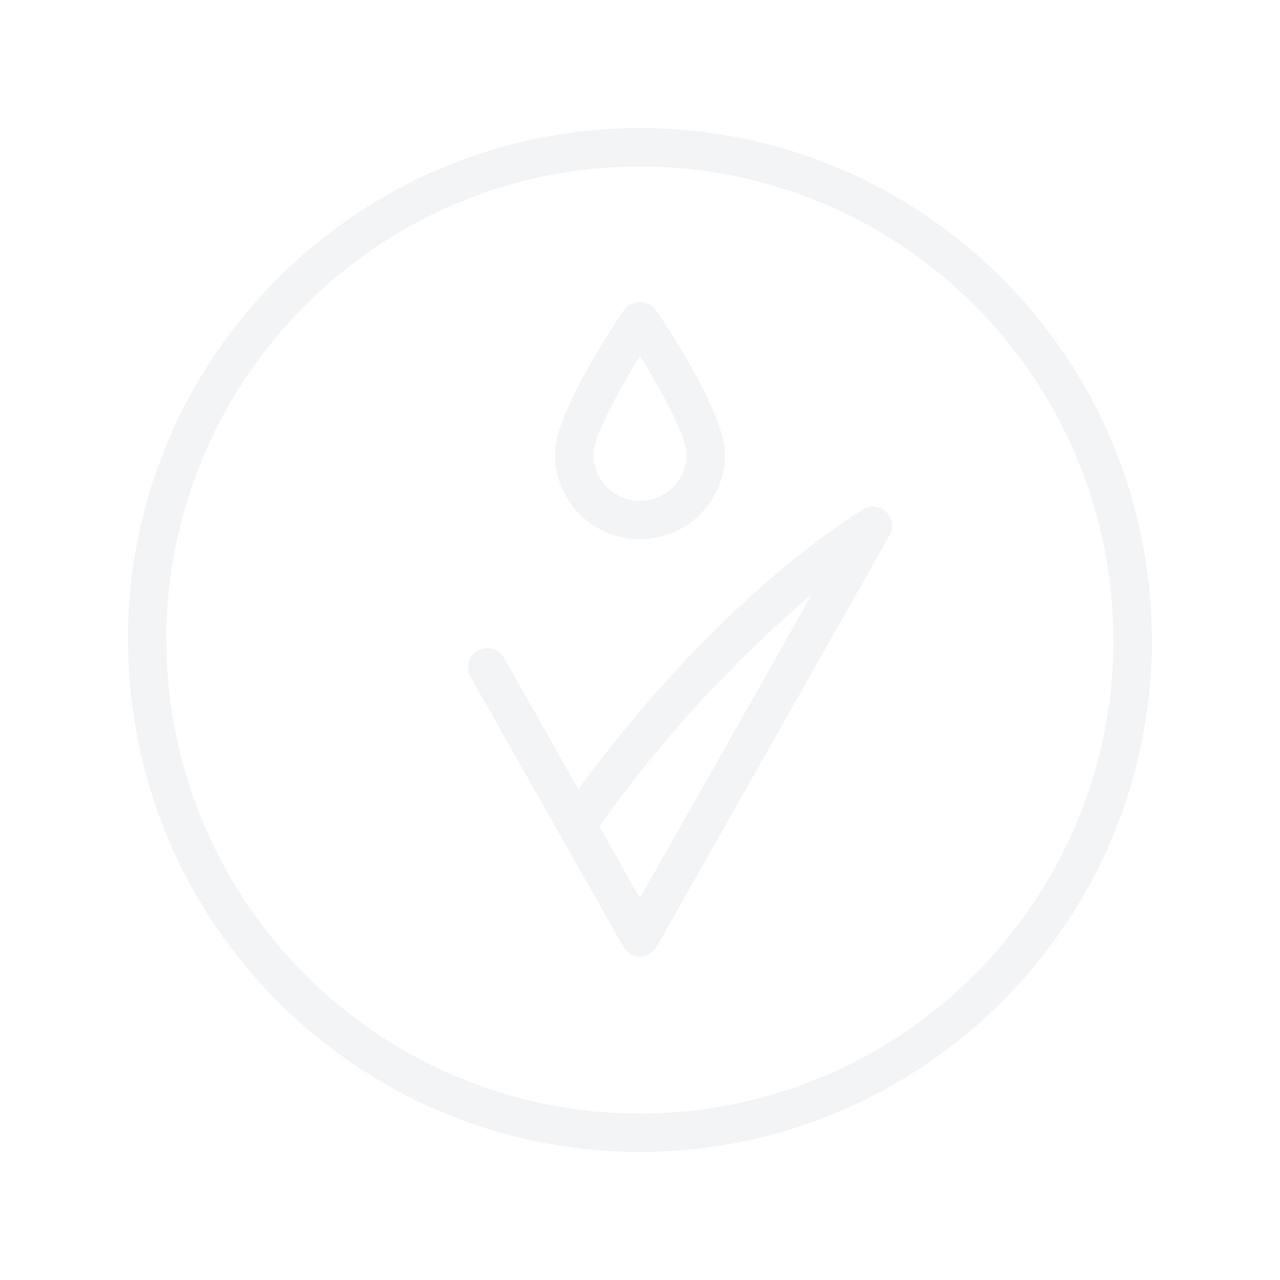 Sleek Makeup Solstice Highlighting Palette 9g